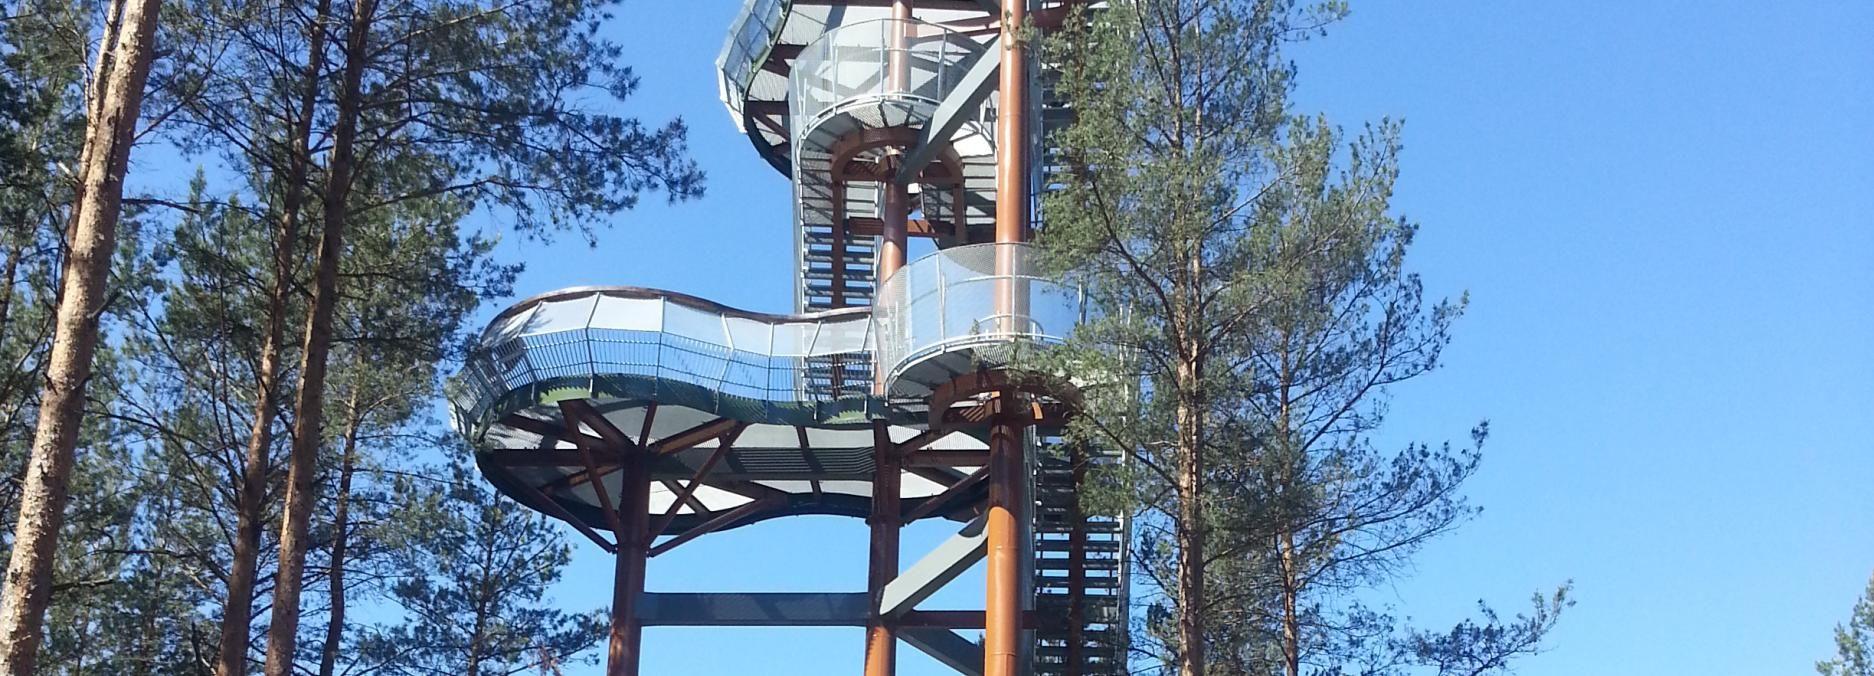 Parque Nacional Dzukija e Grutas Park:-Day Tour Full